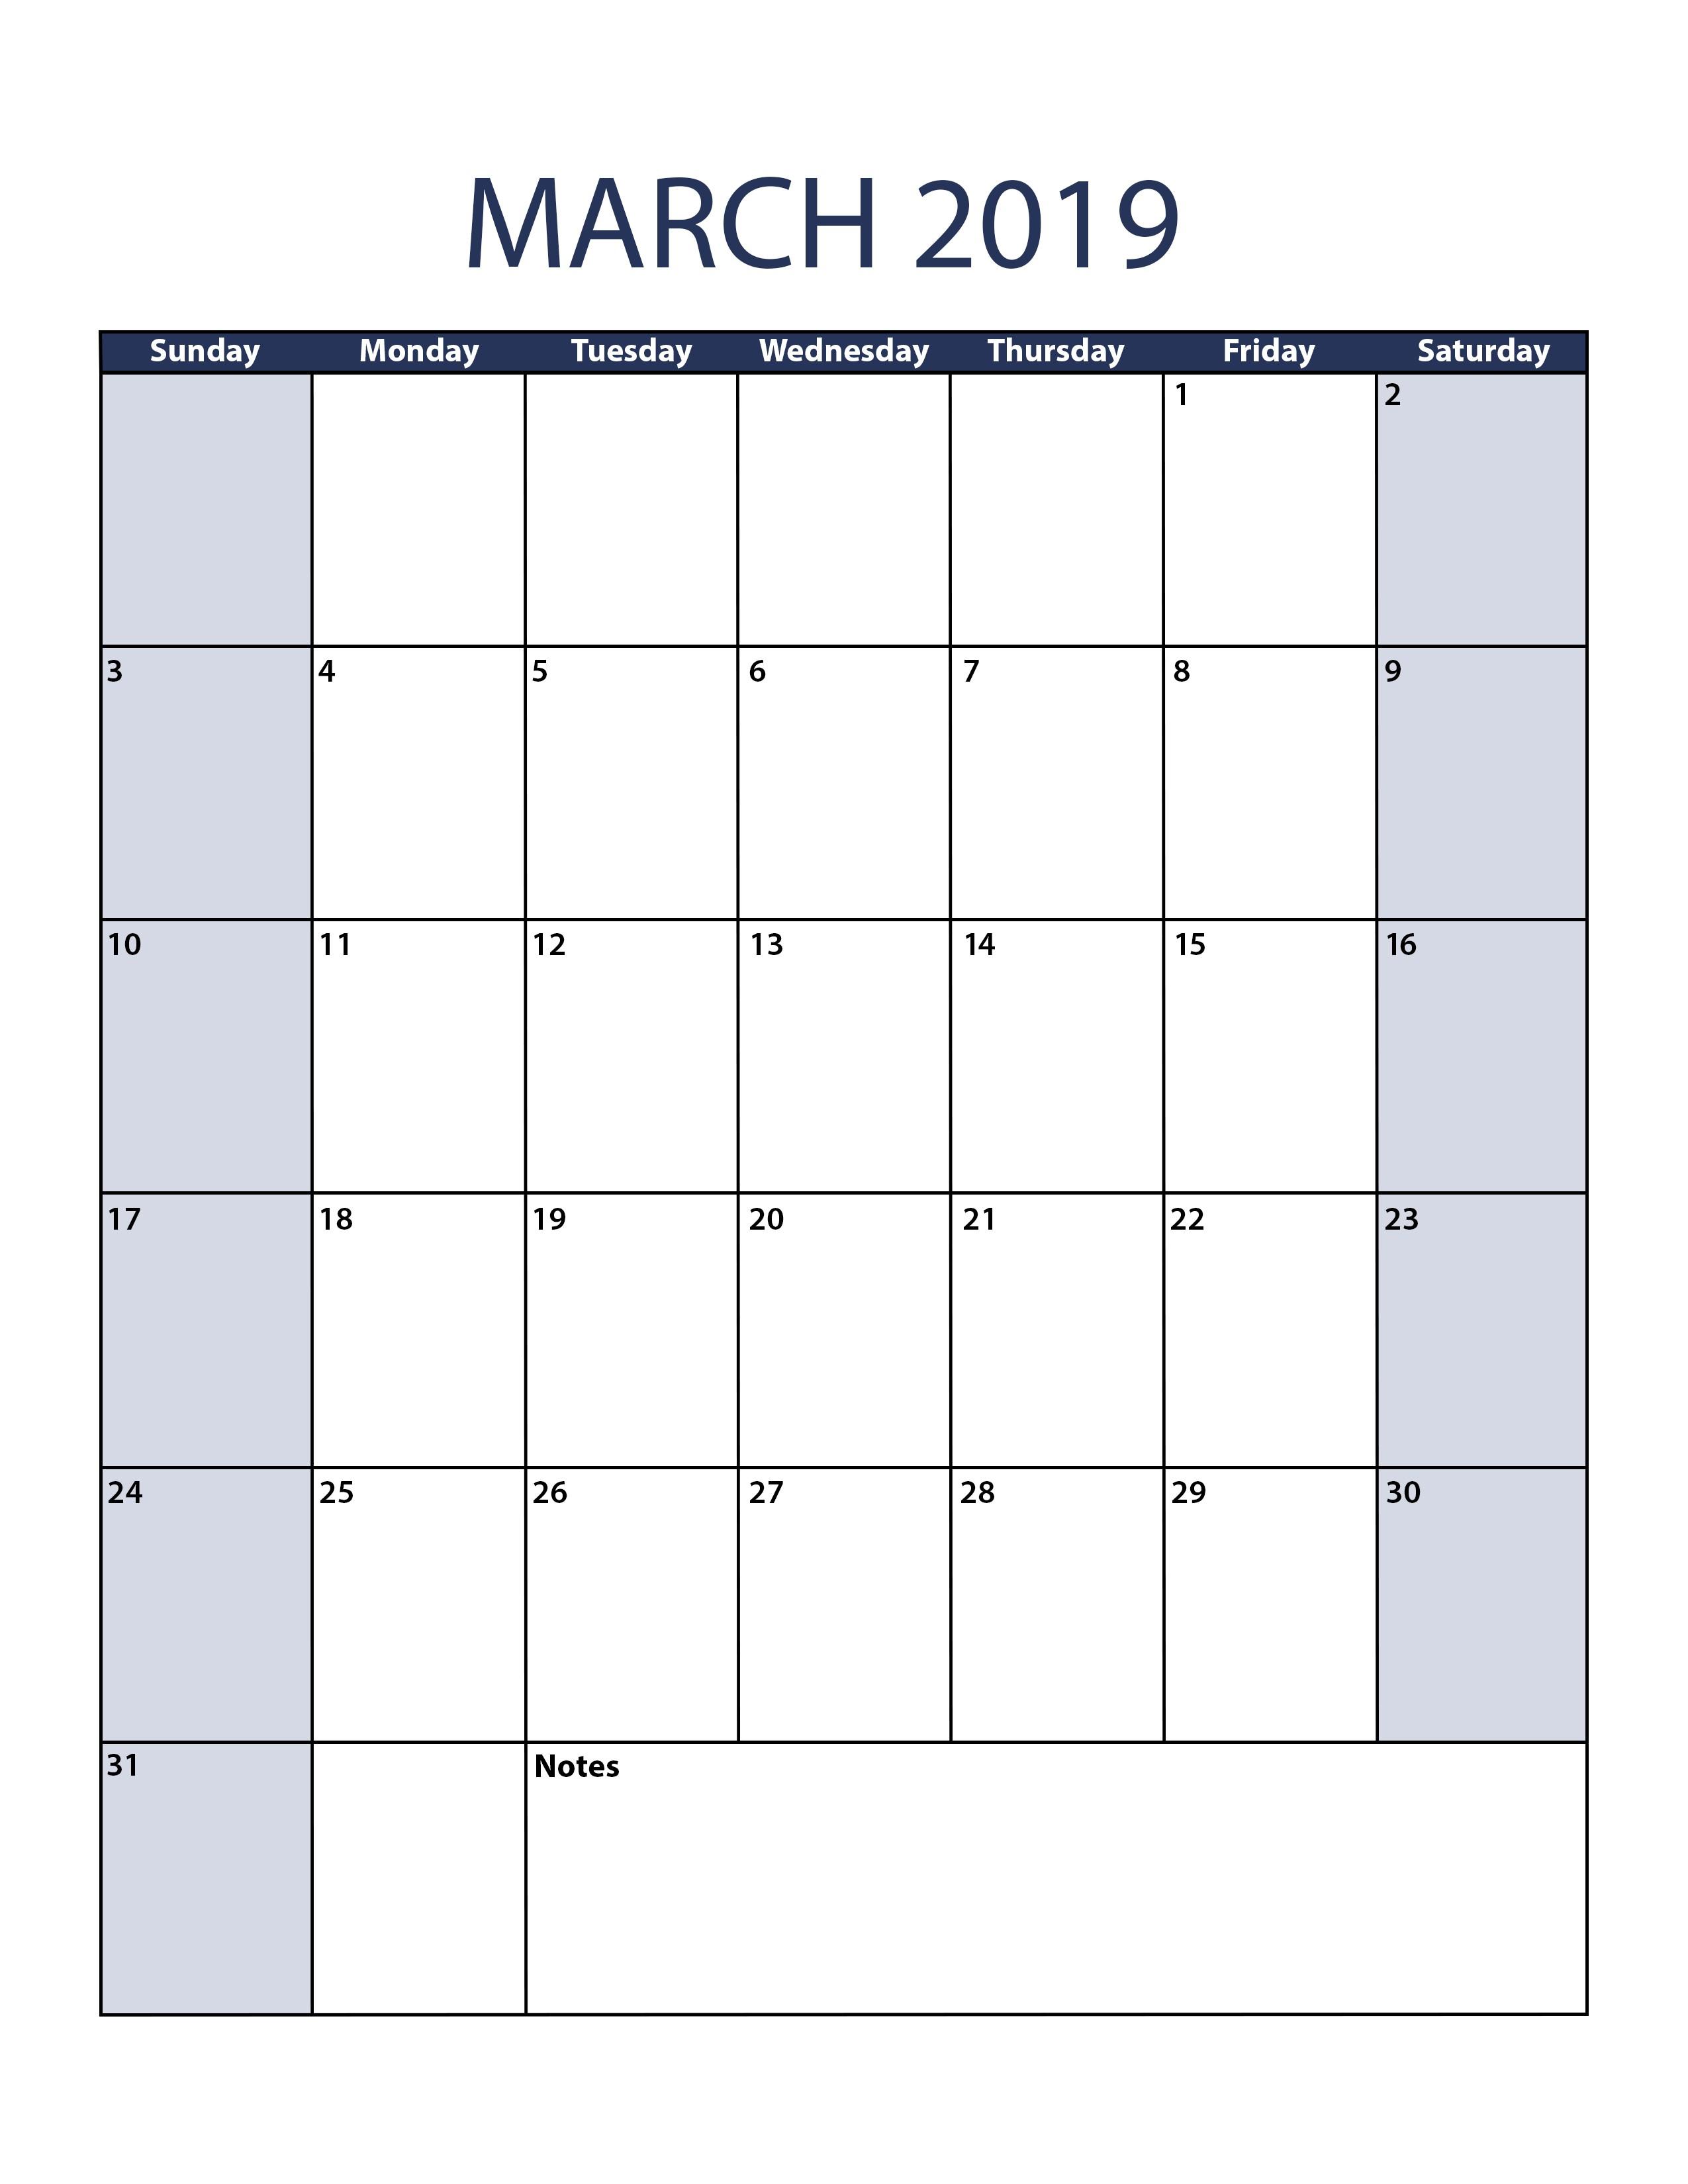 March 2019 Calendar Excel Printable Editable Blank Template Holidays